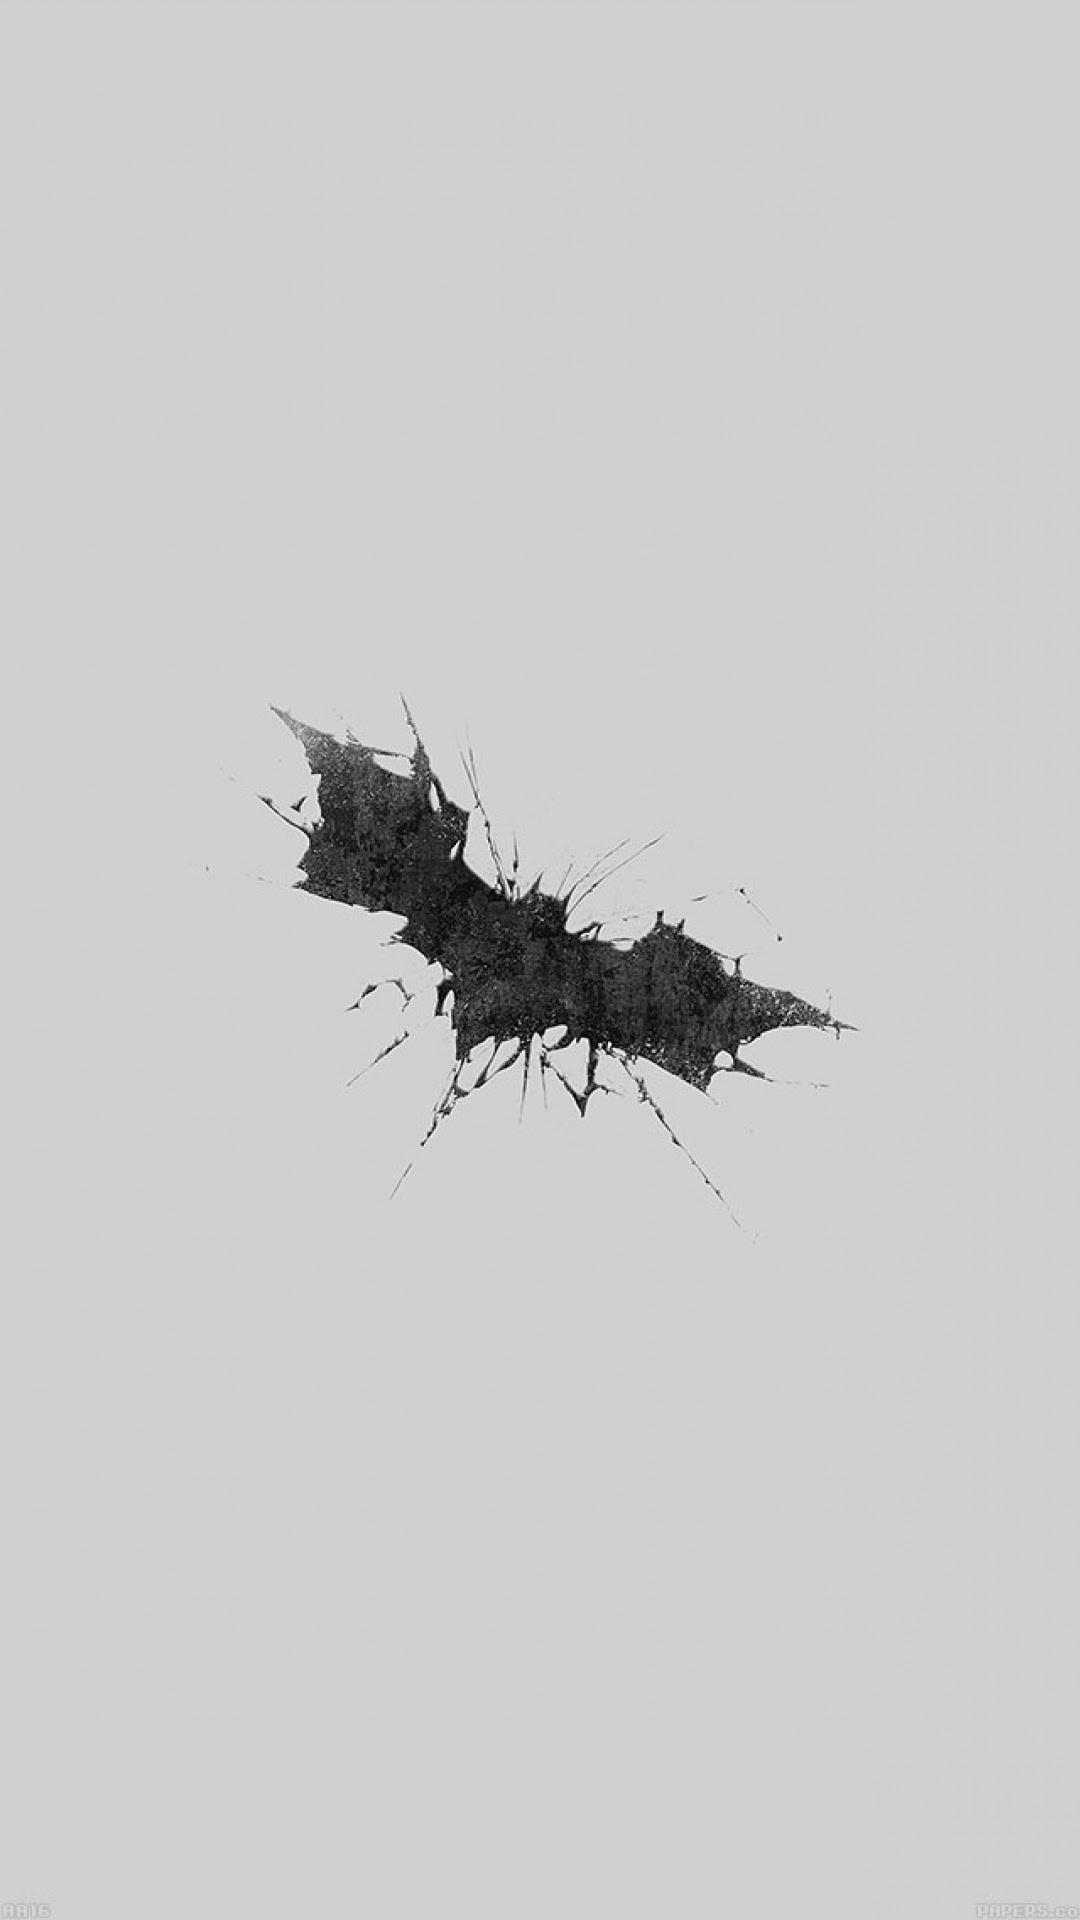 Free 3d Christmas Live Wallpaper For Pc Batman Logo Iphone Wallpapers Pixelstalk Net